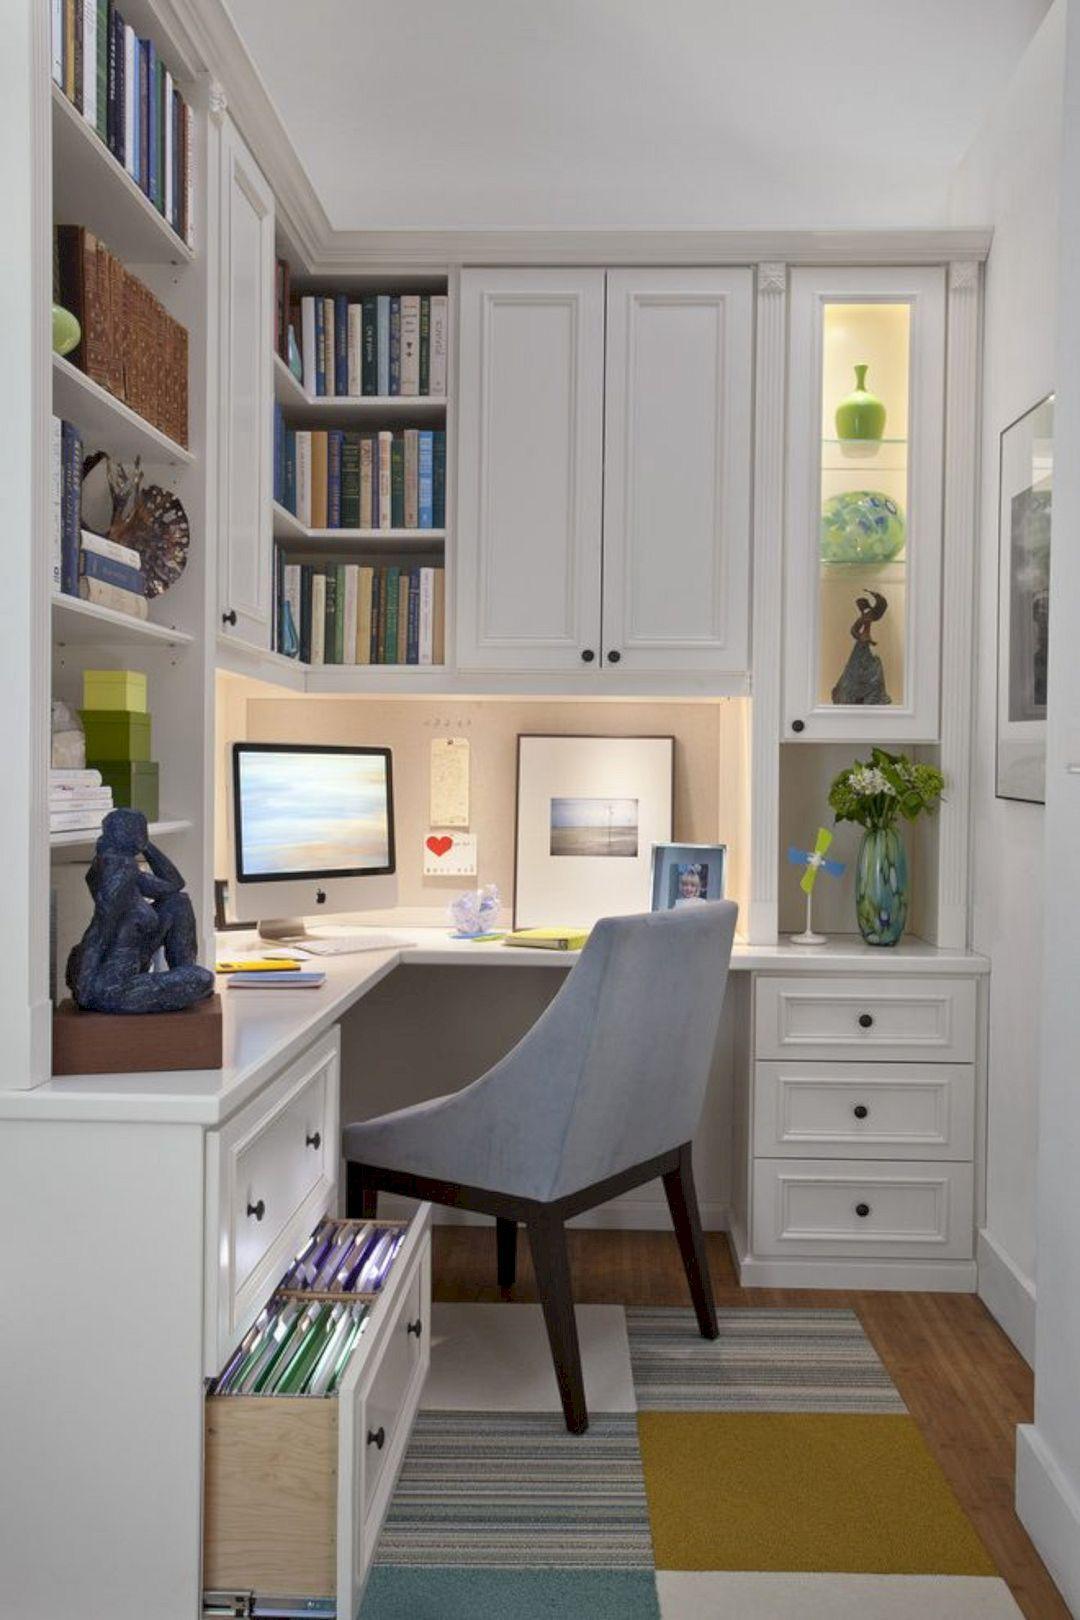 53 Neat Home Office Organizing Ideas Https://www.designlisticle.com/